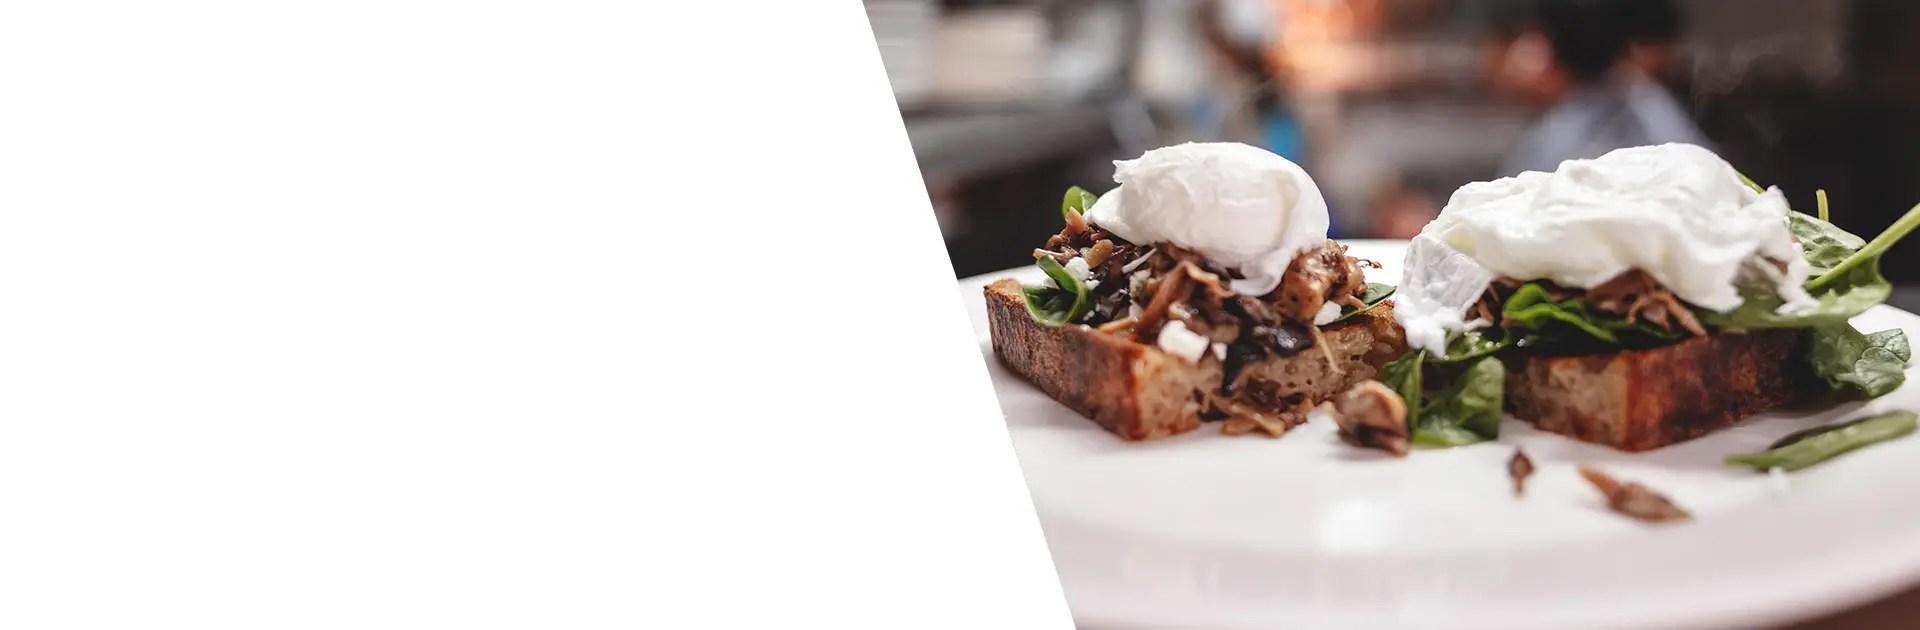 Ananda Fuara Vegetarian Restaurant San Francisco Wild Mushroom Toast